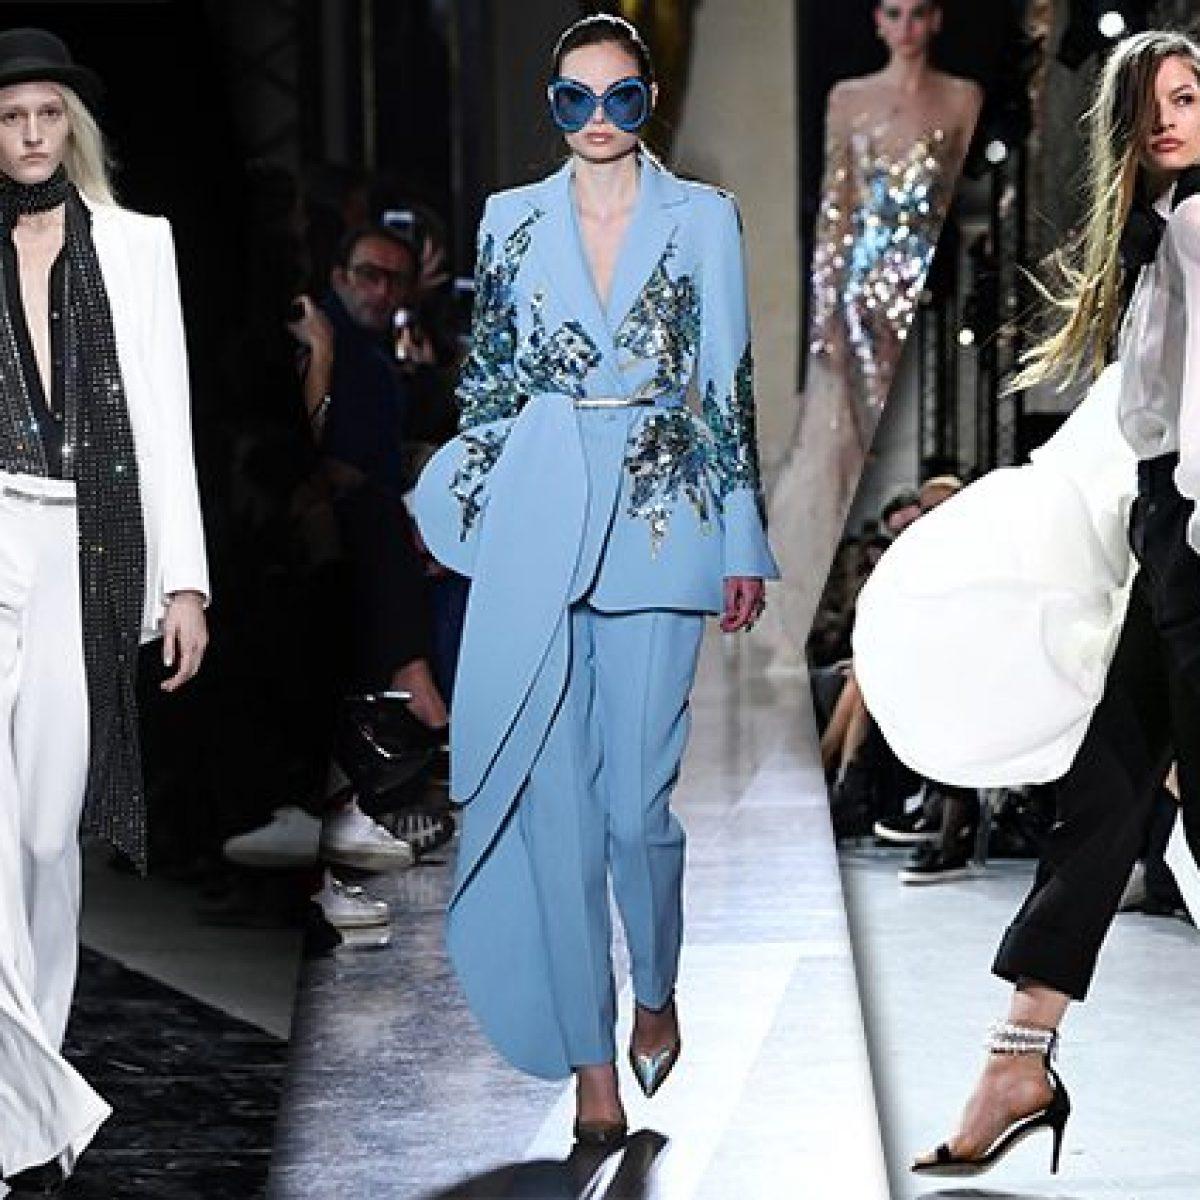 50ae54723a3a Addio gonne da principessa  i pantaloni diventano couture alle sfilate di  Parigi